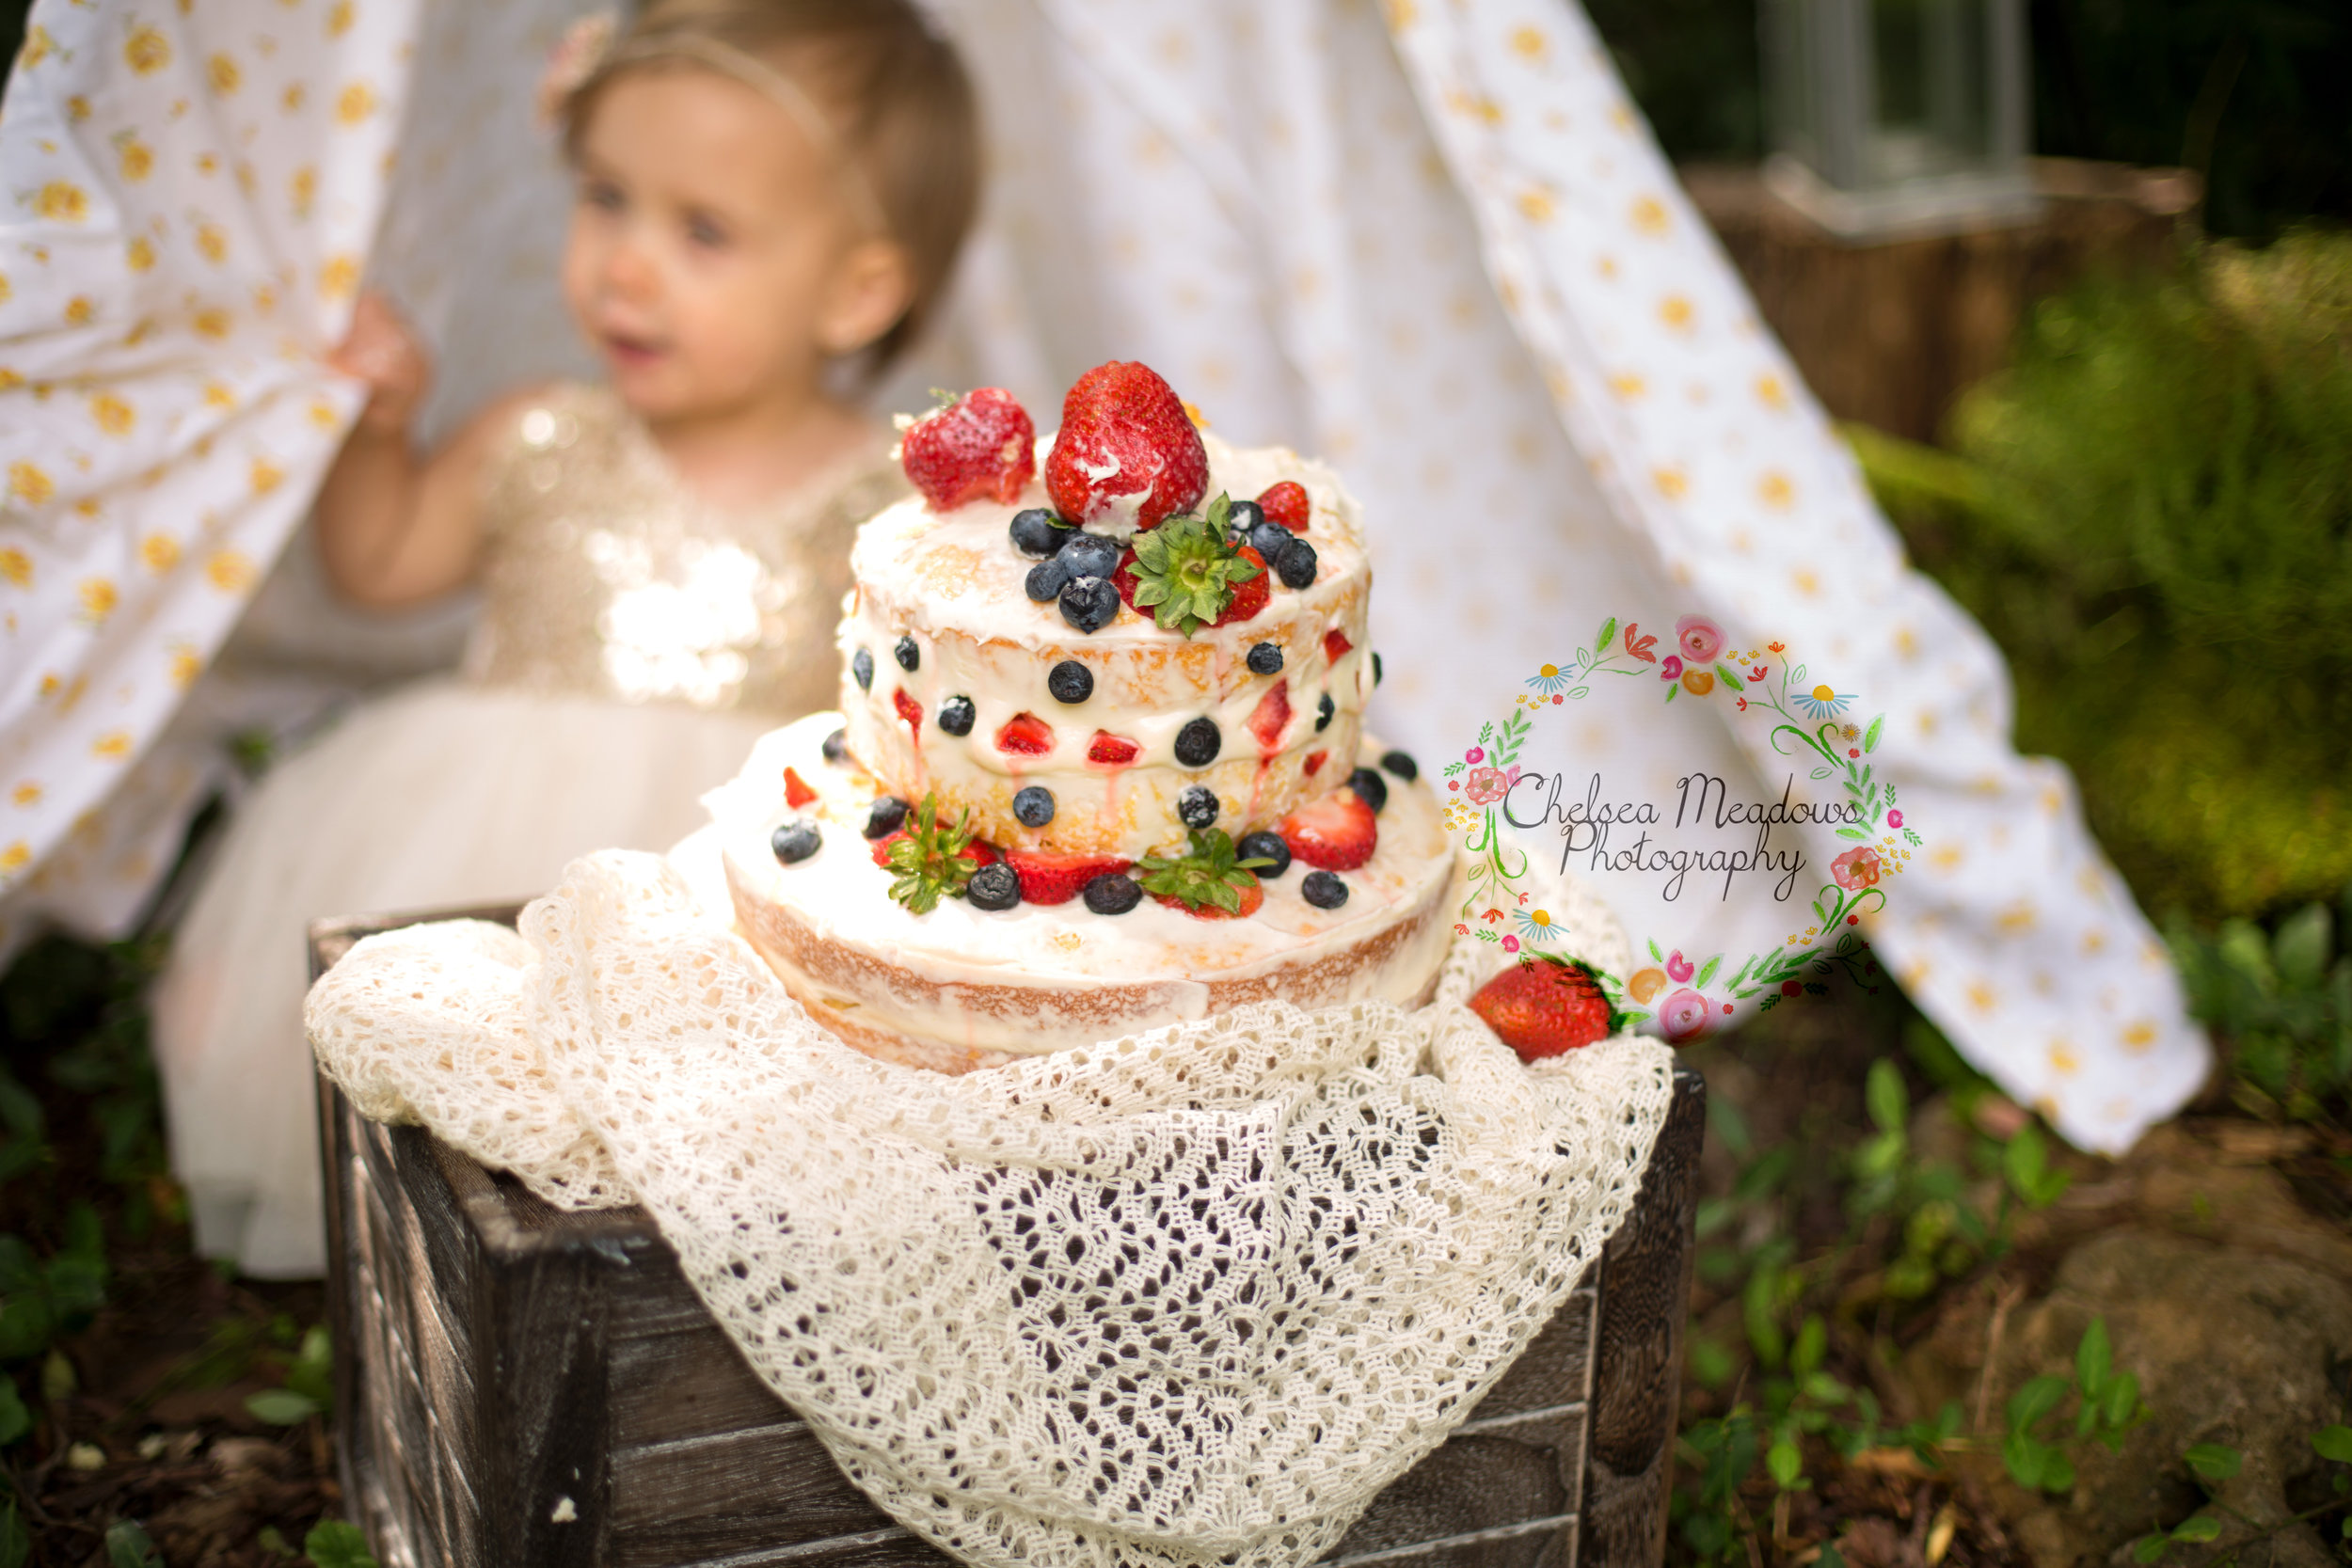 Paisley First Birthay Cake Smash - Nashville Family Photographer - Chelsea Meadows Photography (1).jpg